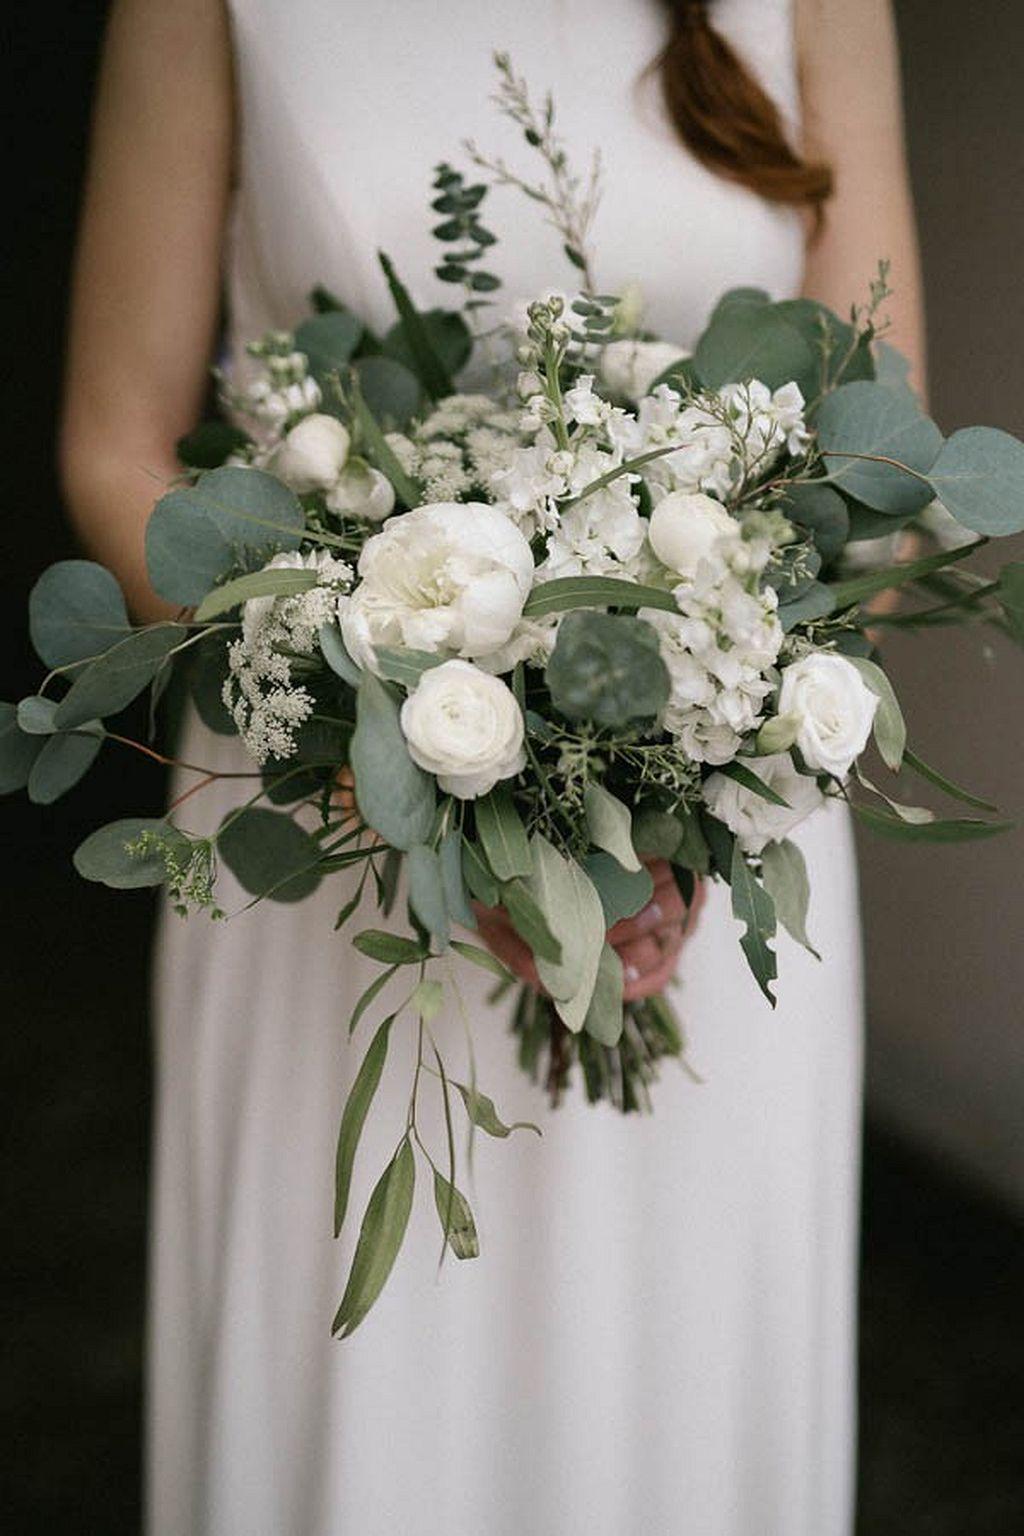 greenery wedding ideas But bigger greeneryusuch wedding